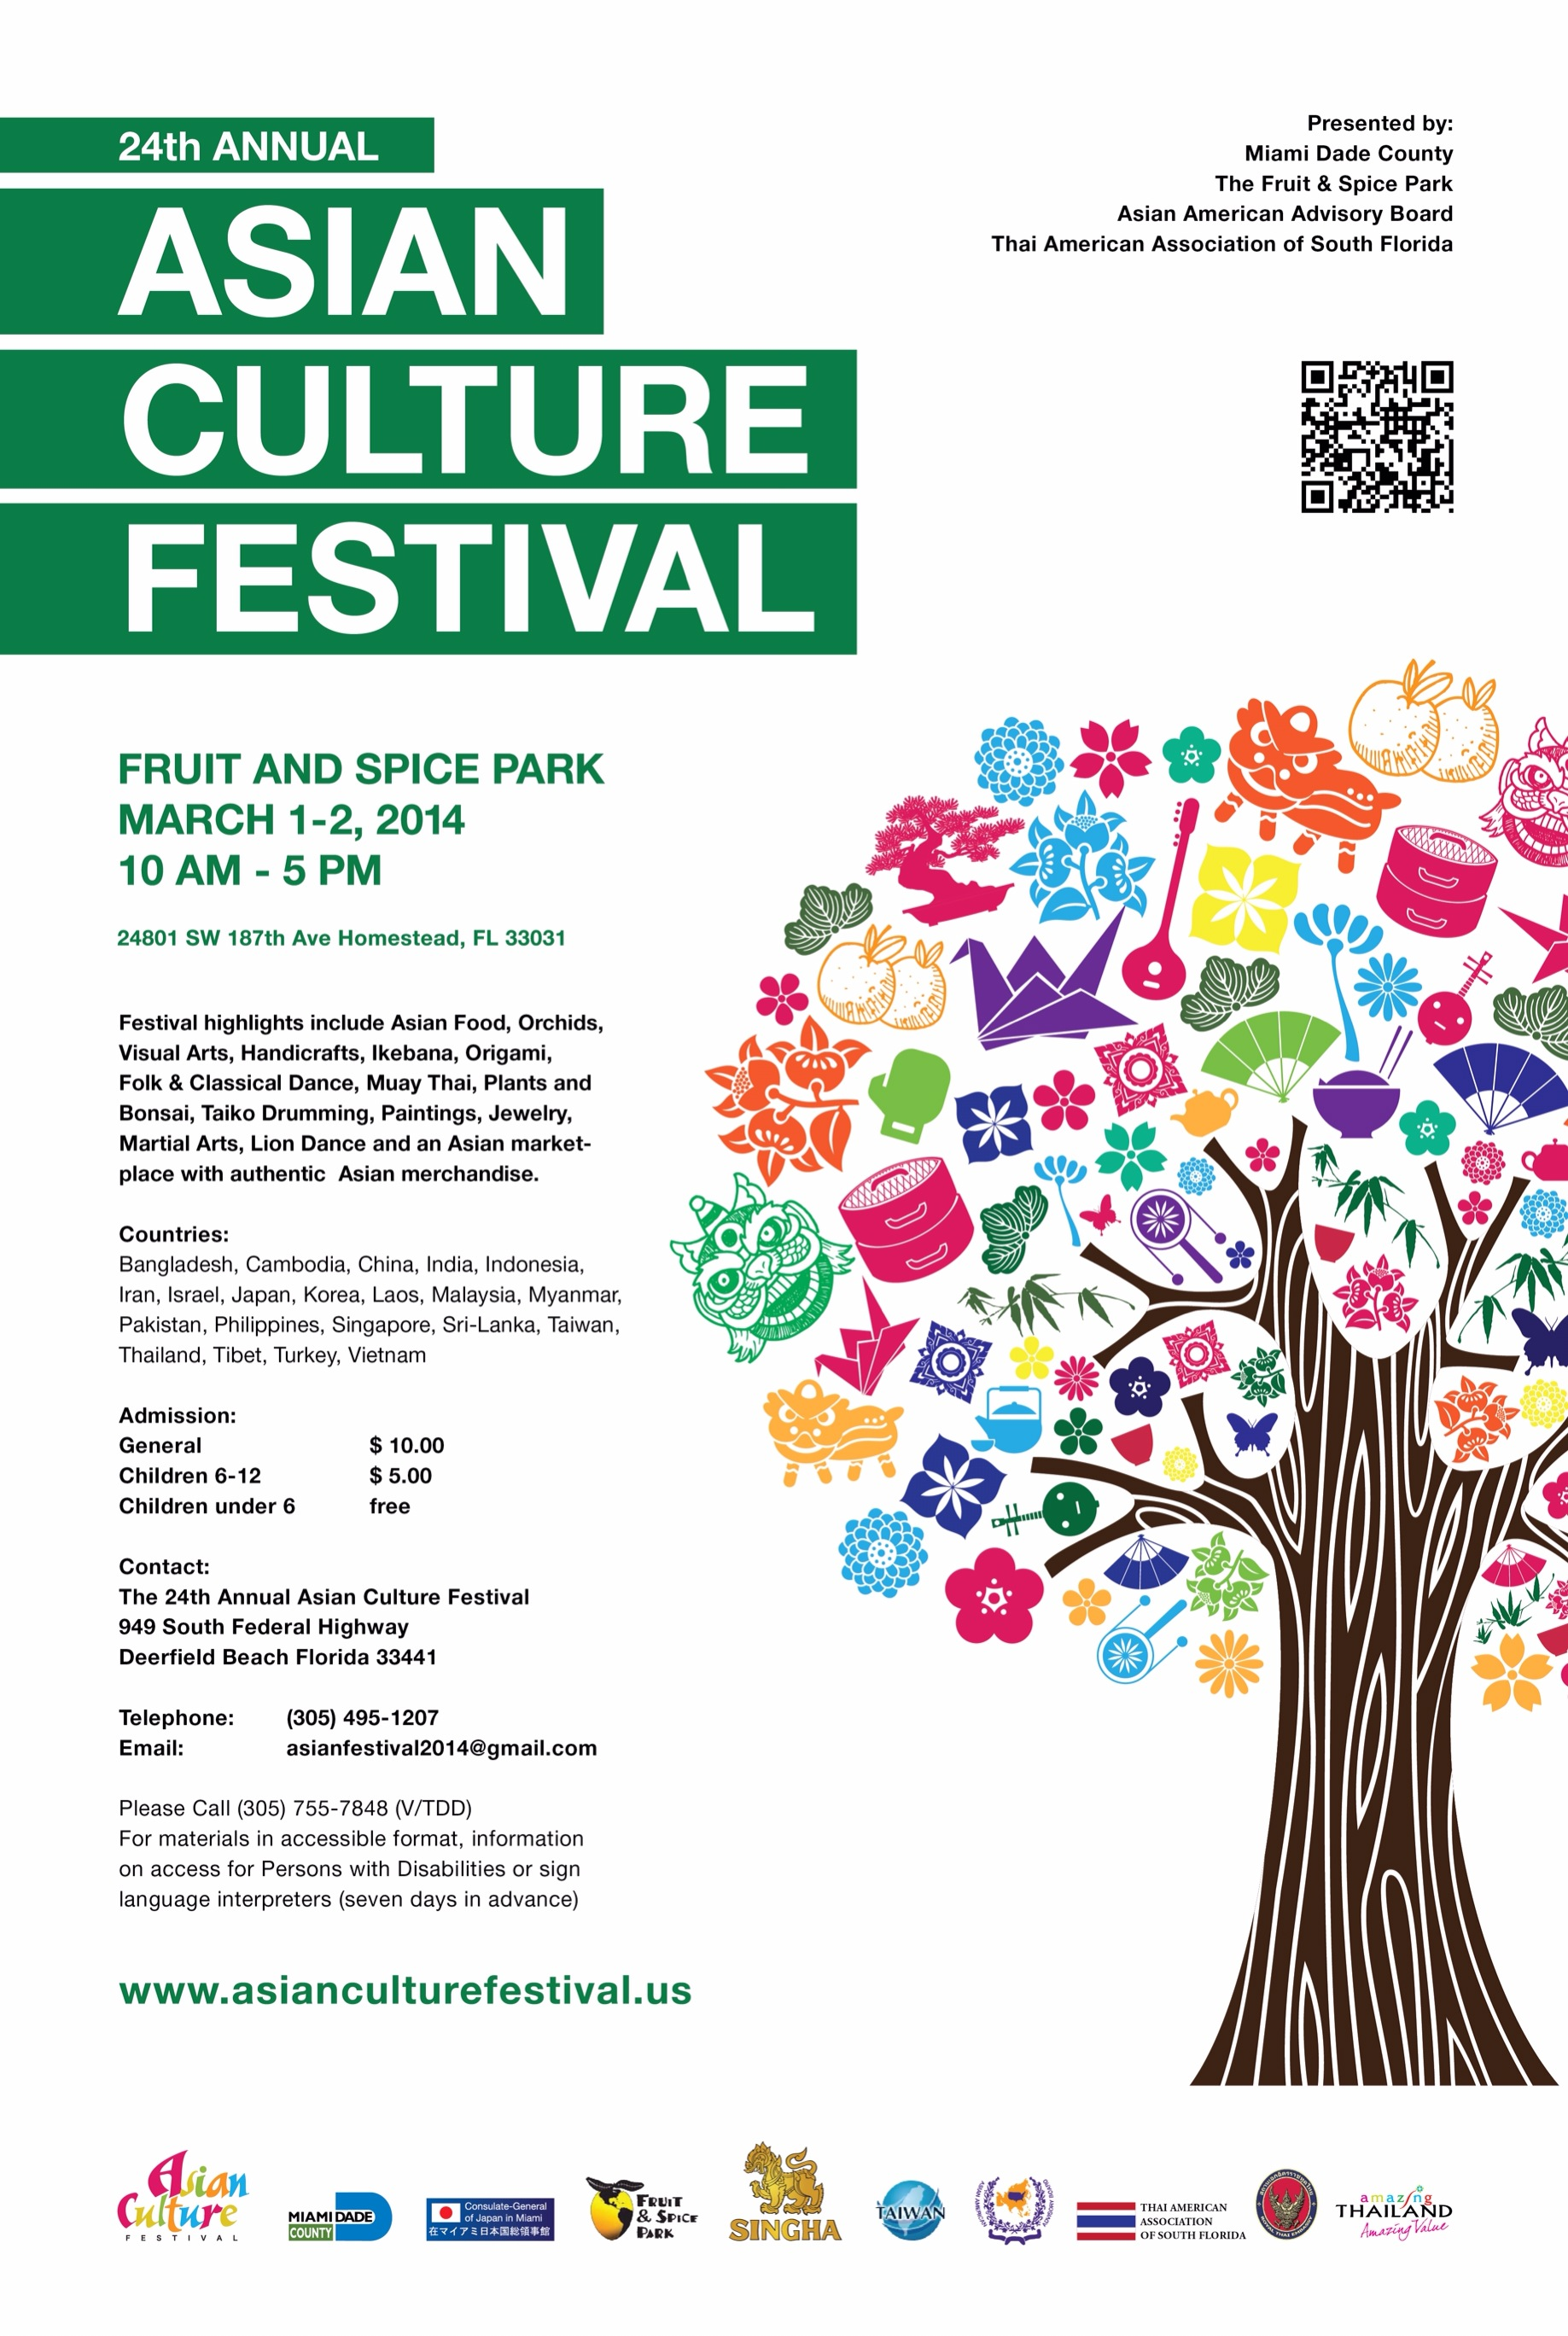 The Asian Culture Festival 2014